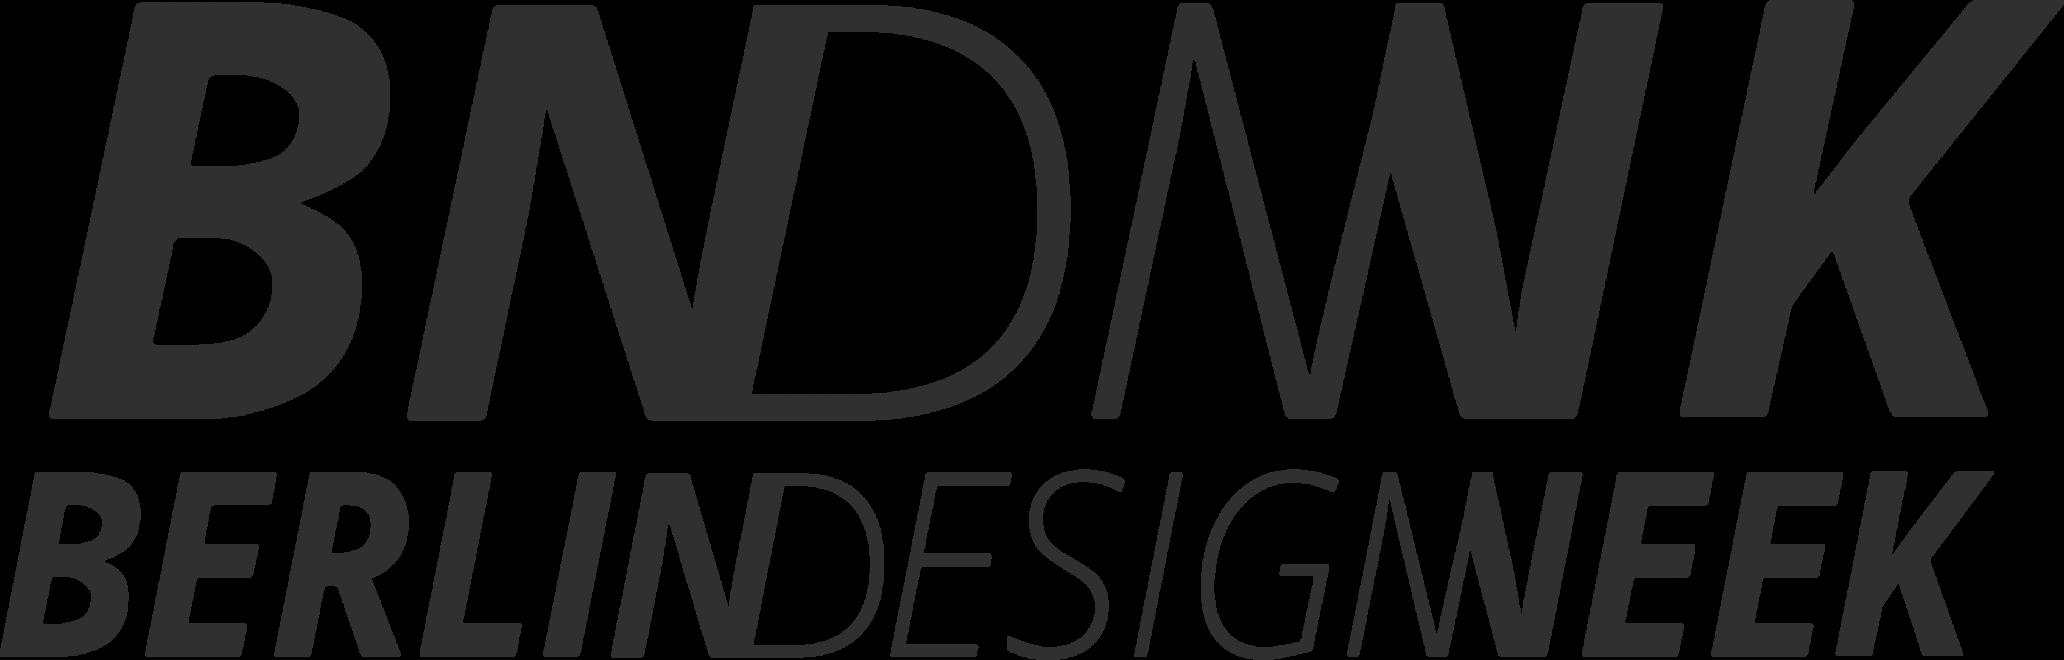 Berlin Design Week